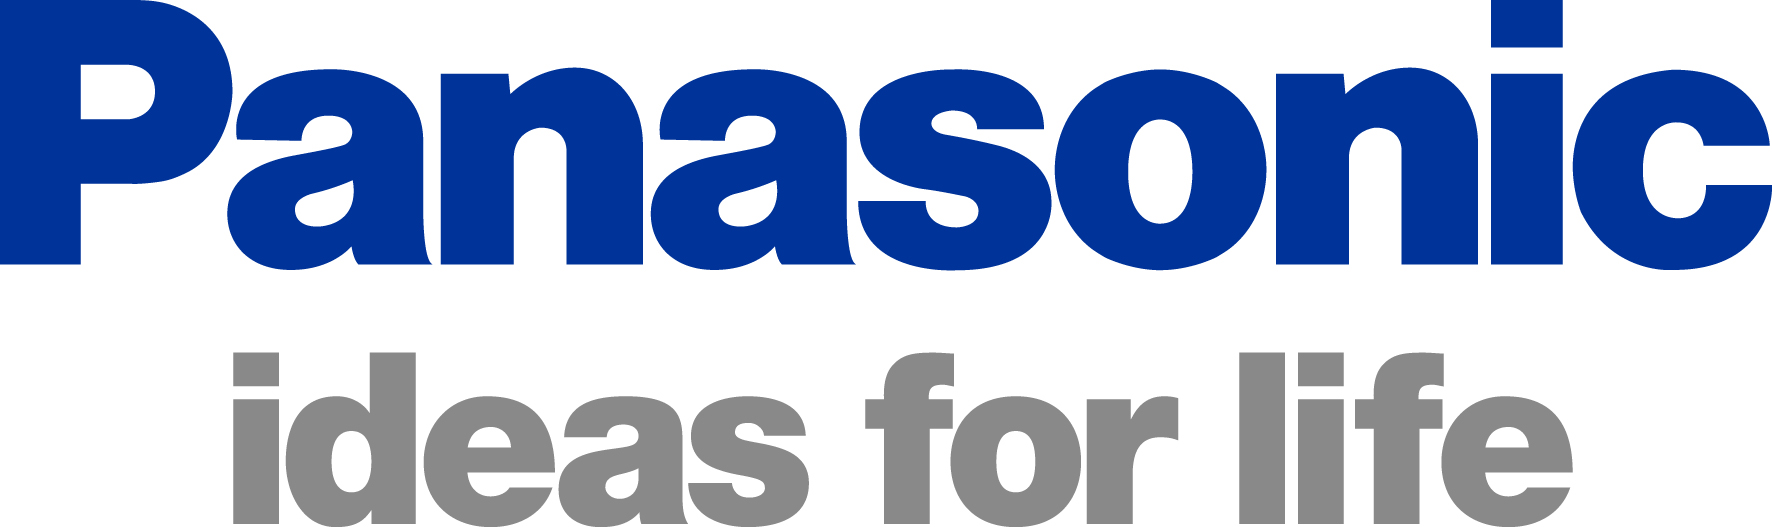 Panasonic Refrigeration Devices Singapore Pte Ltd - Panasonic PNG